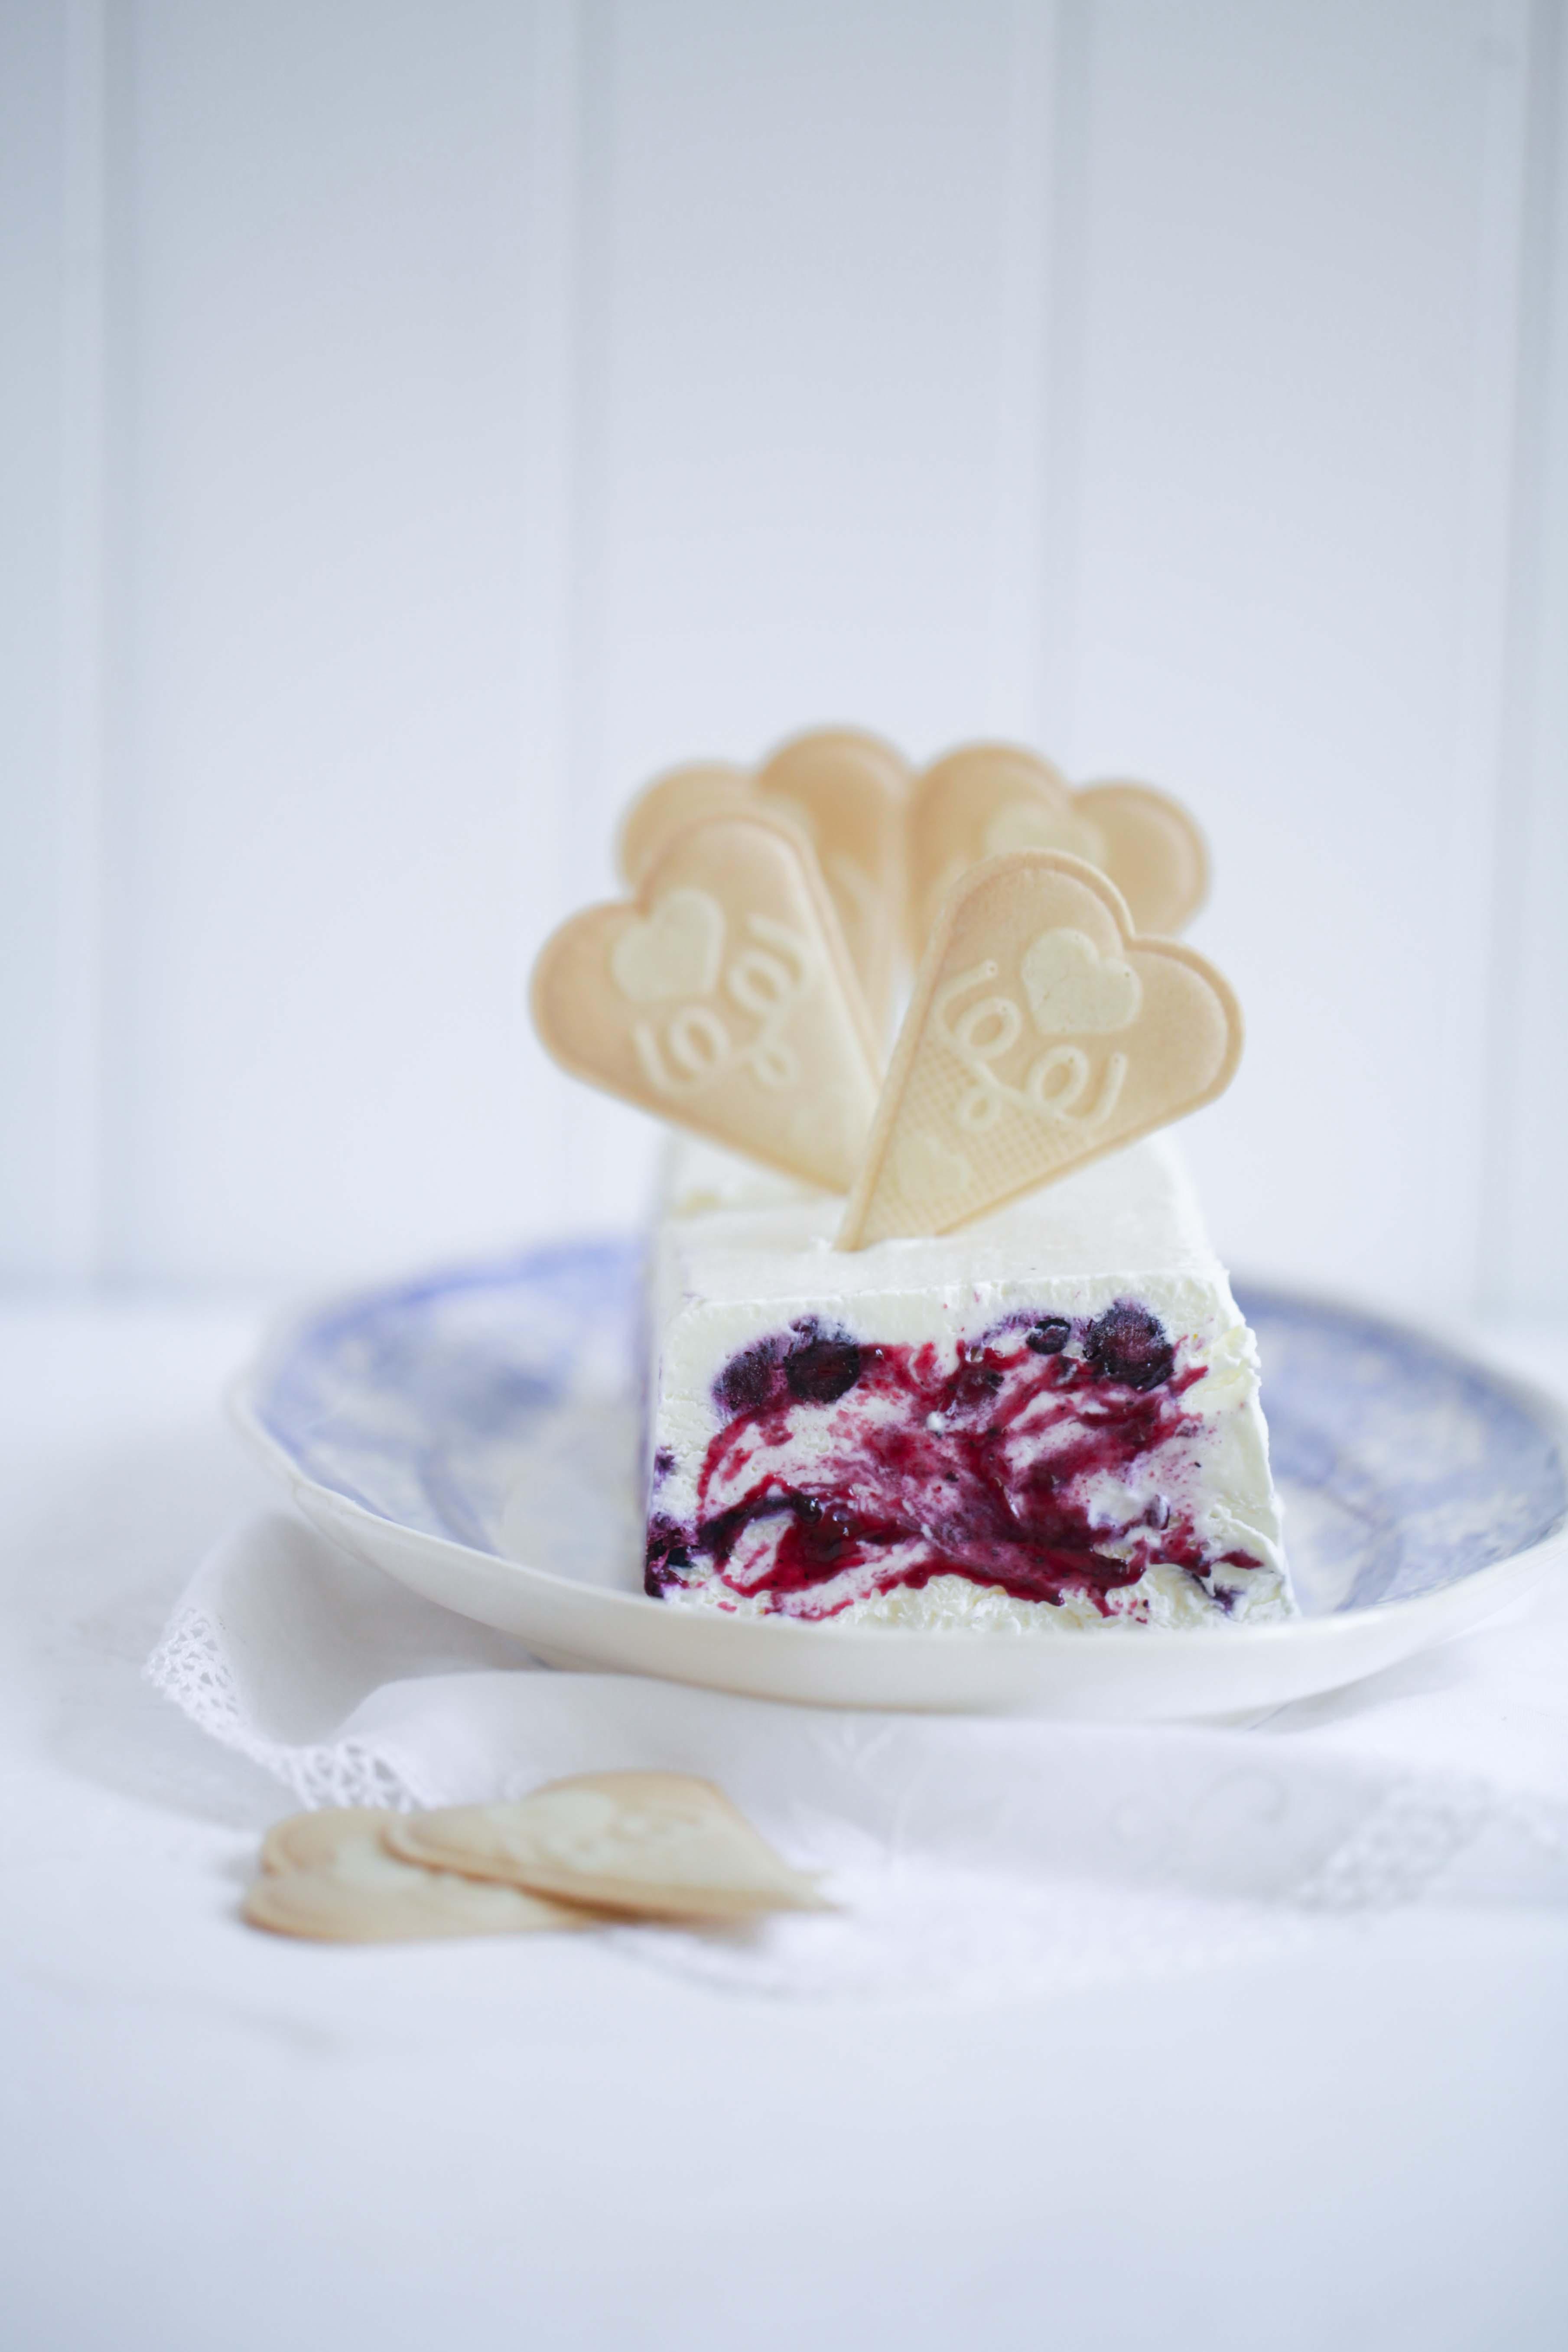 Selbstgemachtes Eis Mit Ofengeschmorten Vanille Blaubeeren